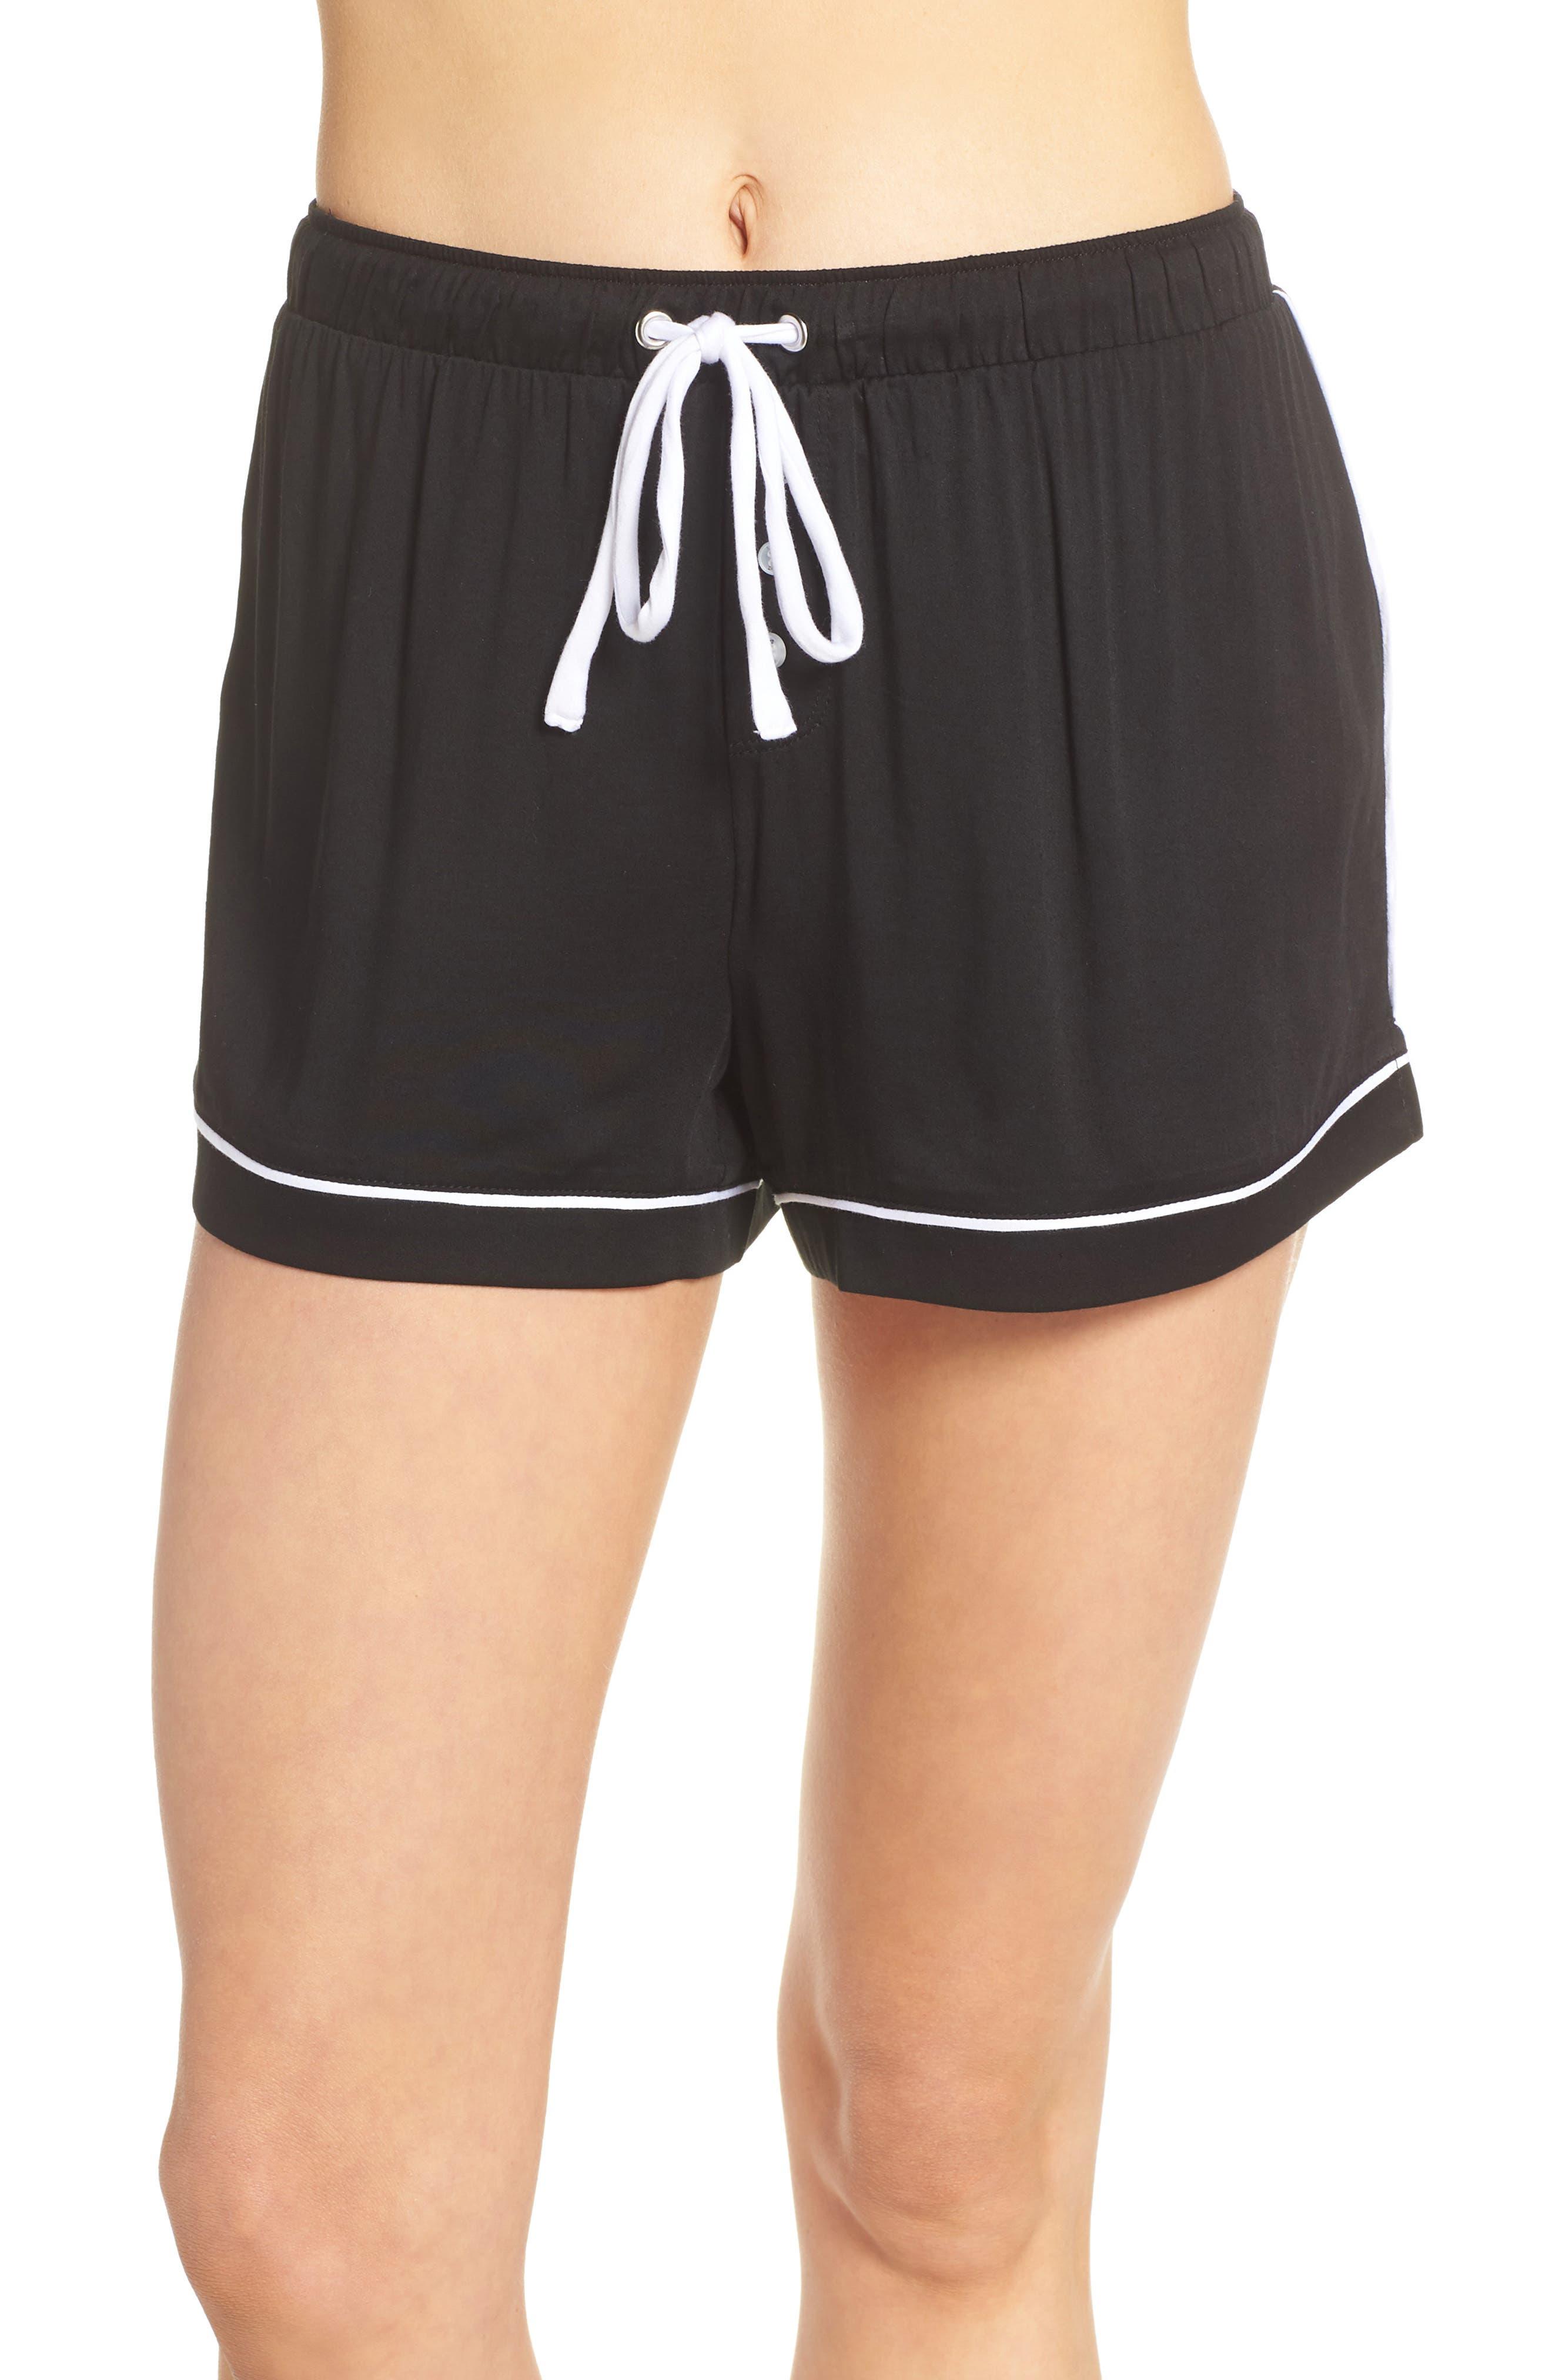 Splendid Pajama Shorts, Black